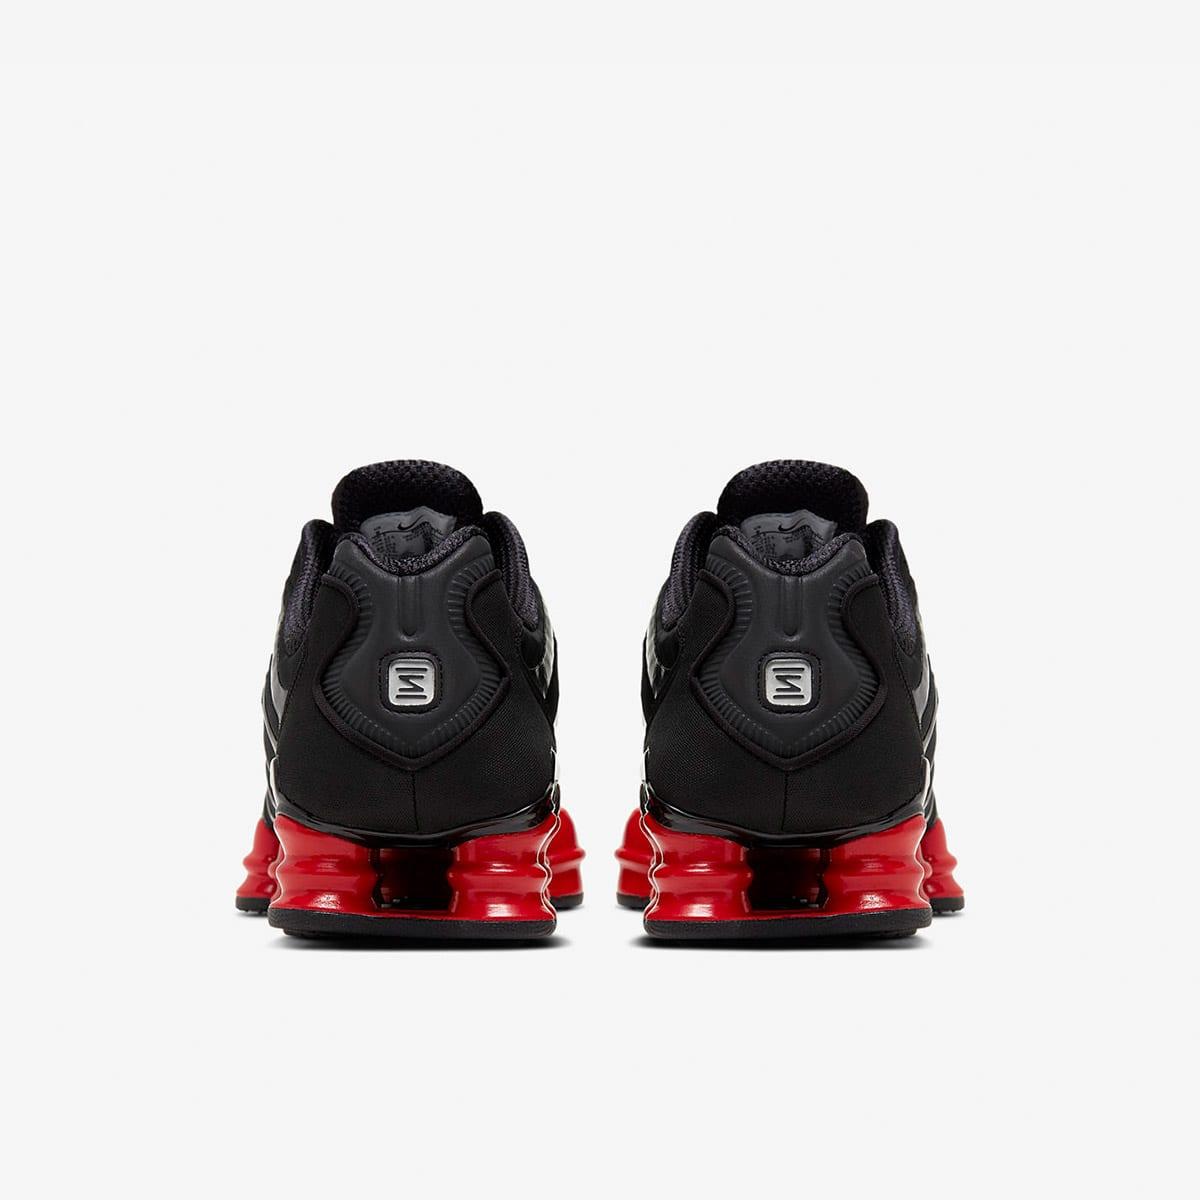 Nike x Skepta Shox - CI0987-001